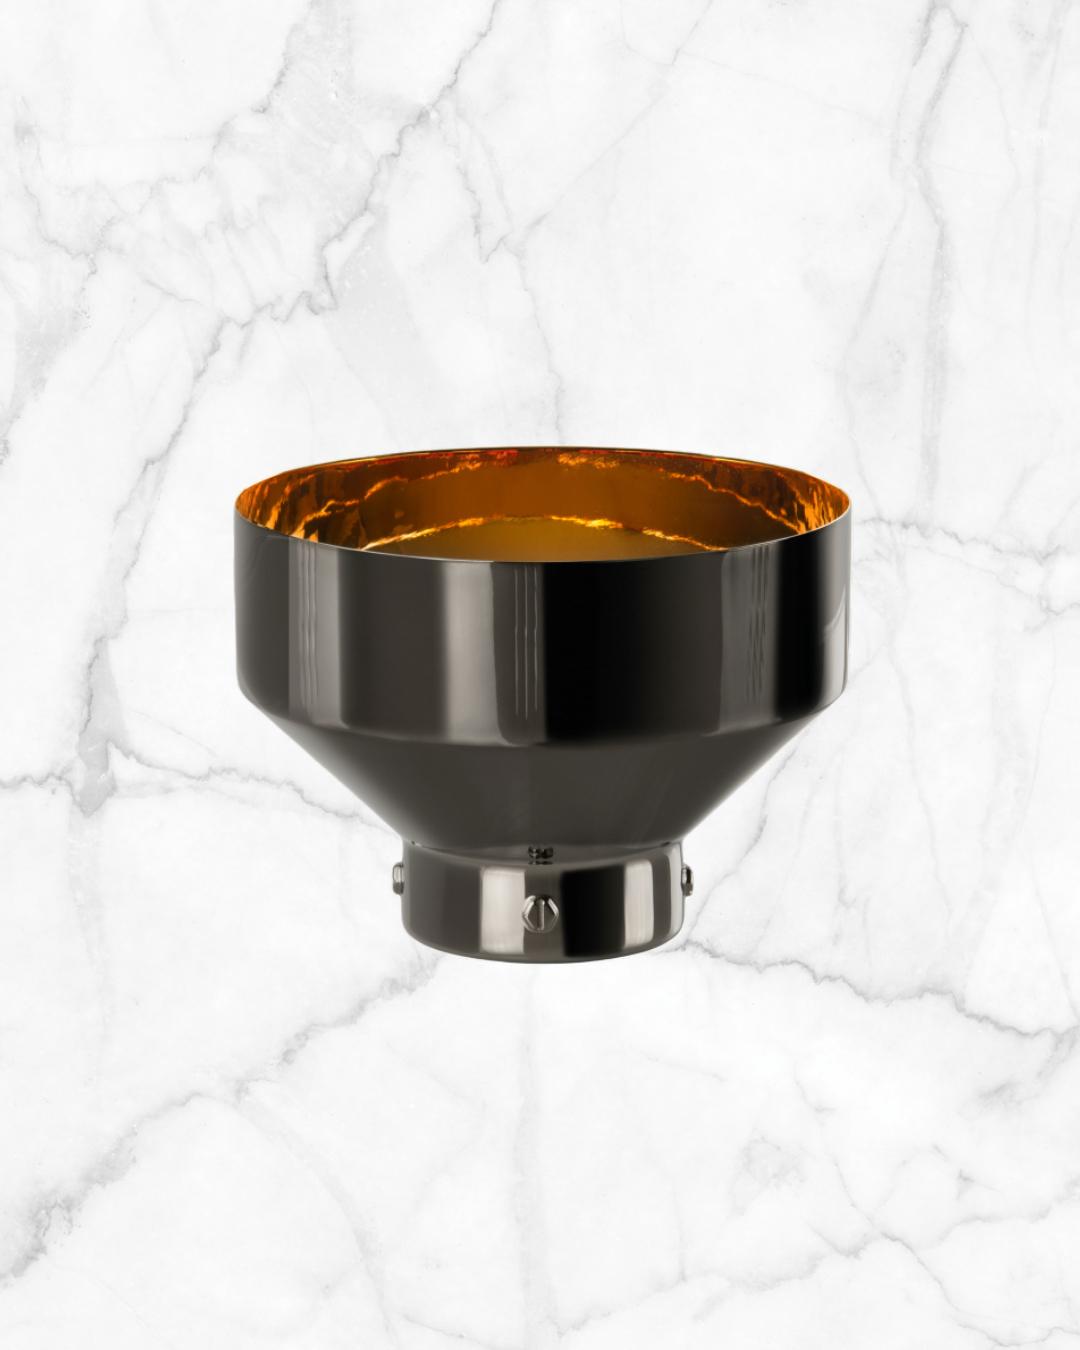 luxury-bowl-gioi-barock-2